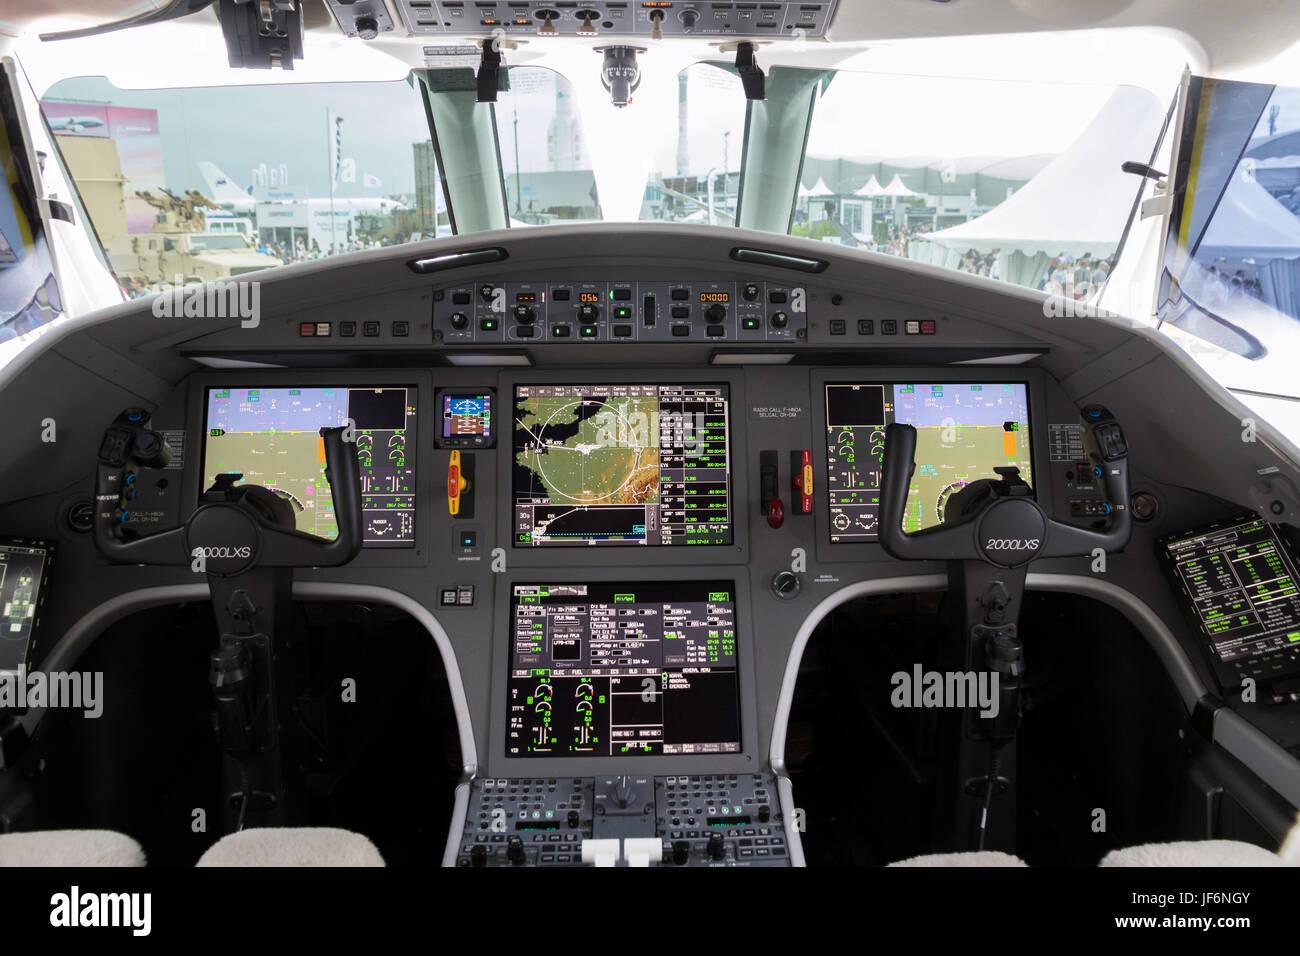 PARIS, FRANCE - JUN 23, 2017: Modern glass cockpit of the Dassault Falcon 2000LX business jet at the Paris Air Show - Stock Image